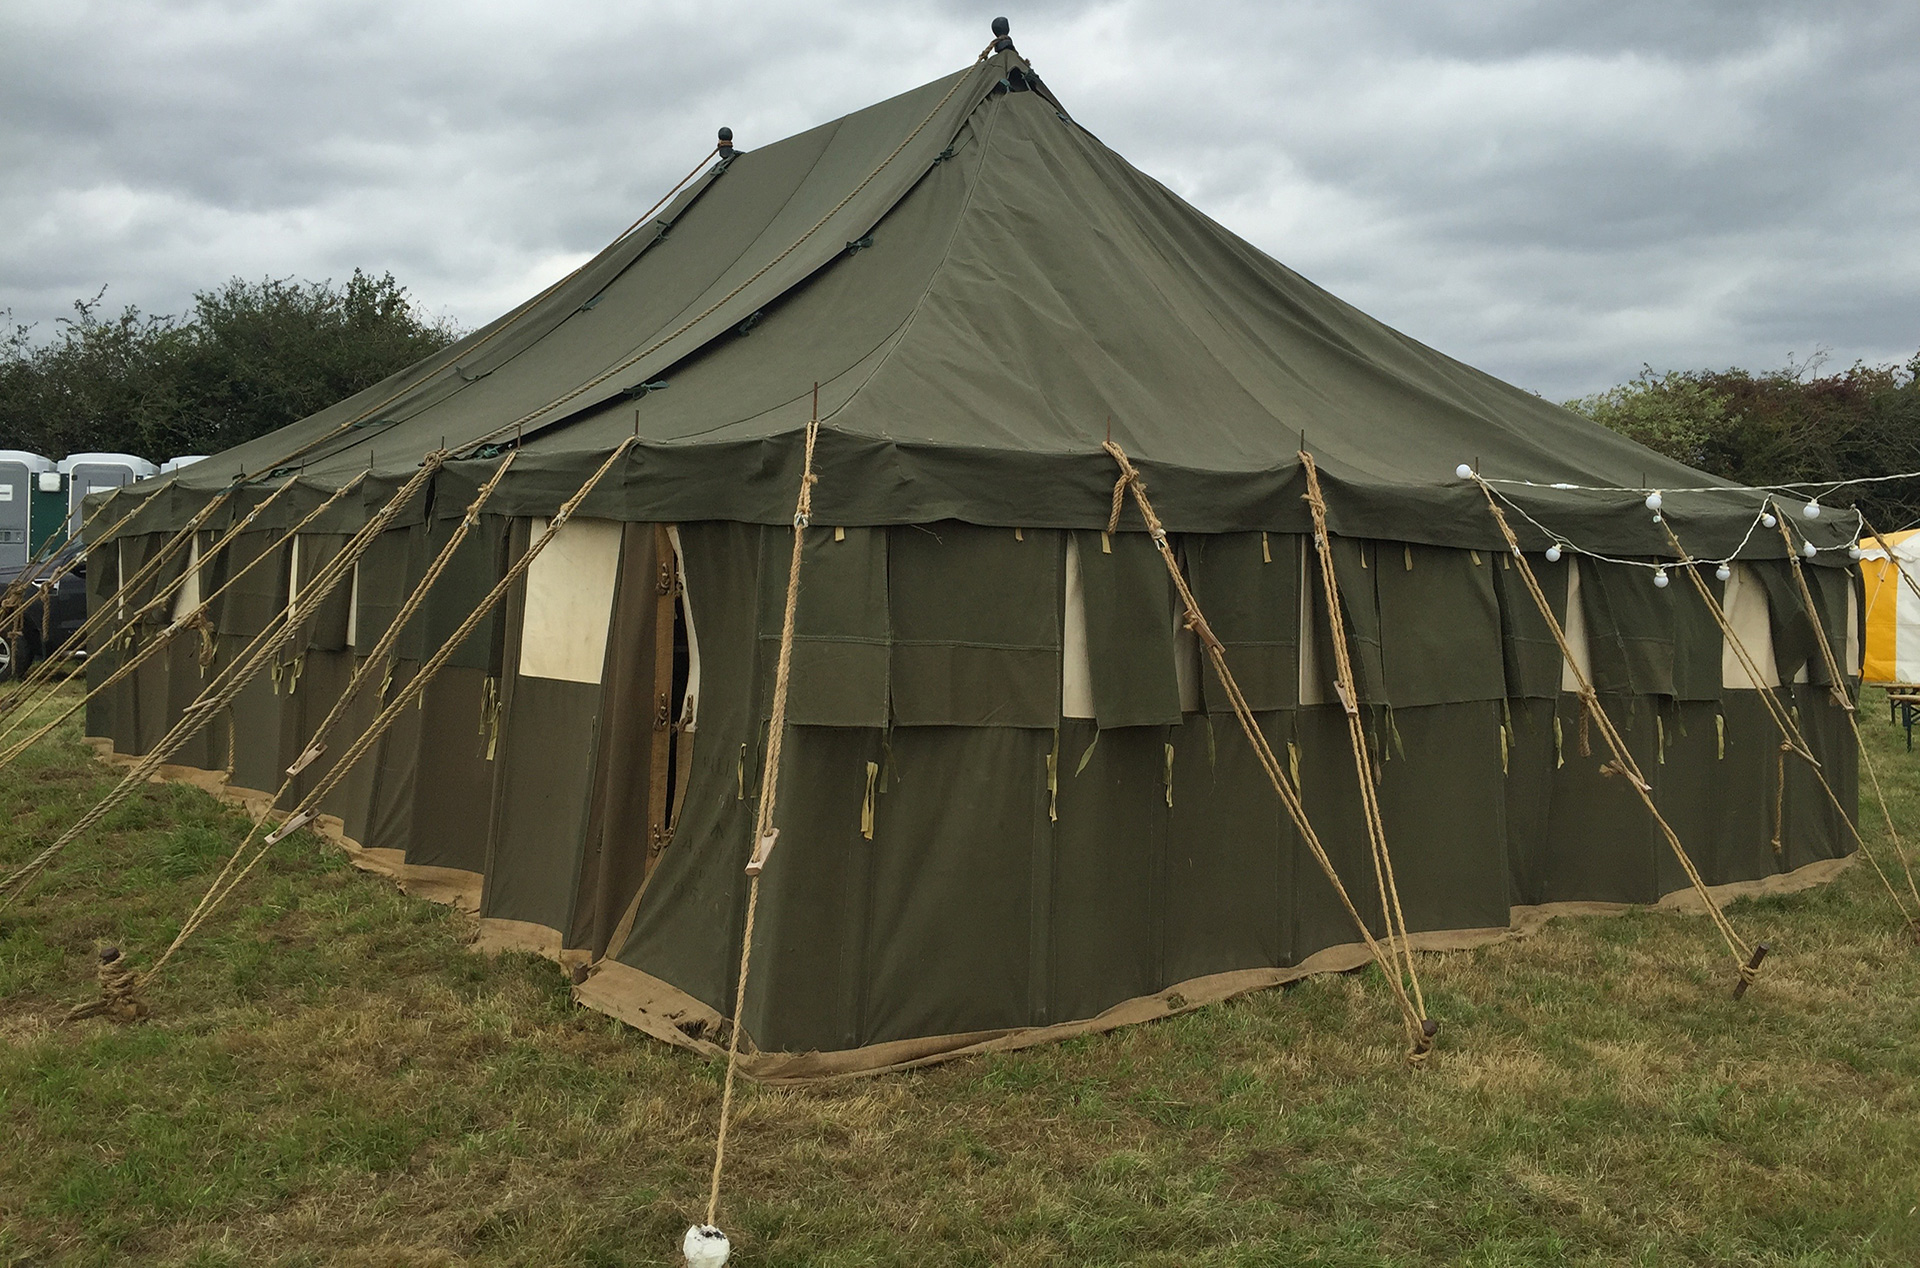 Our Captain Mainwaring Tent